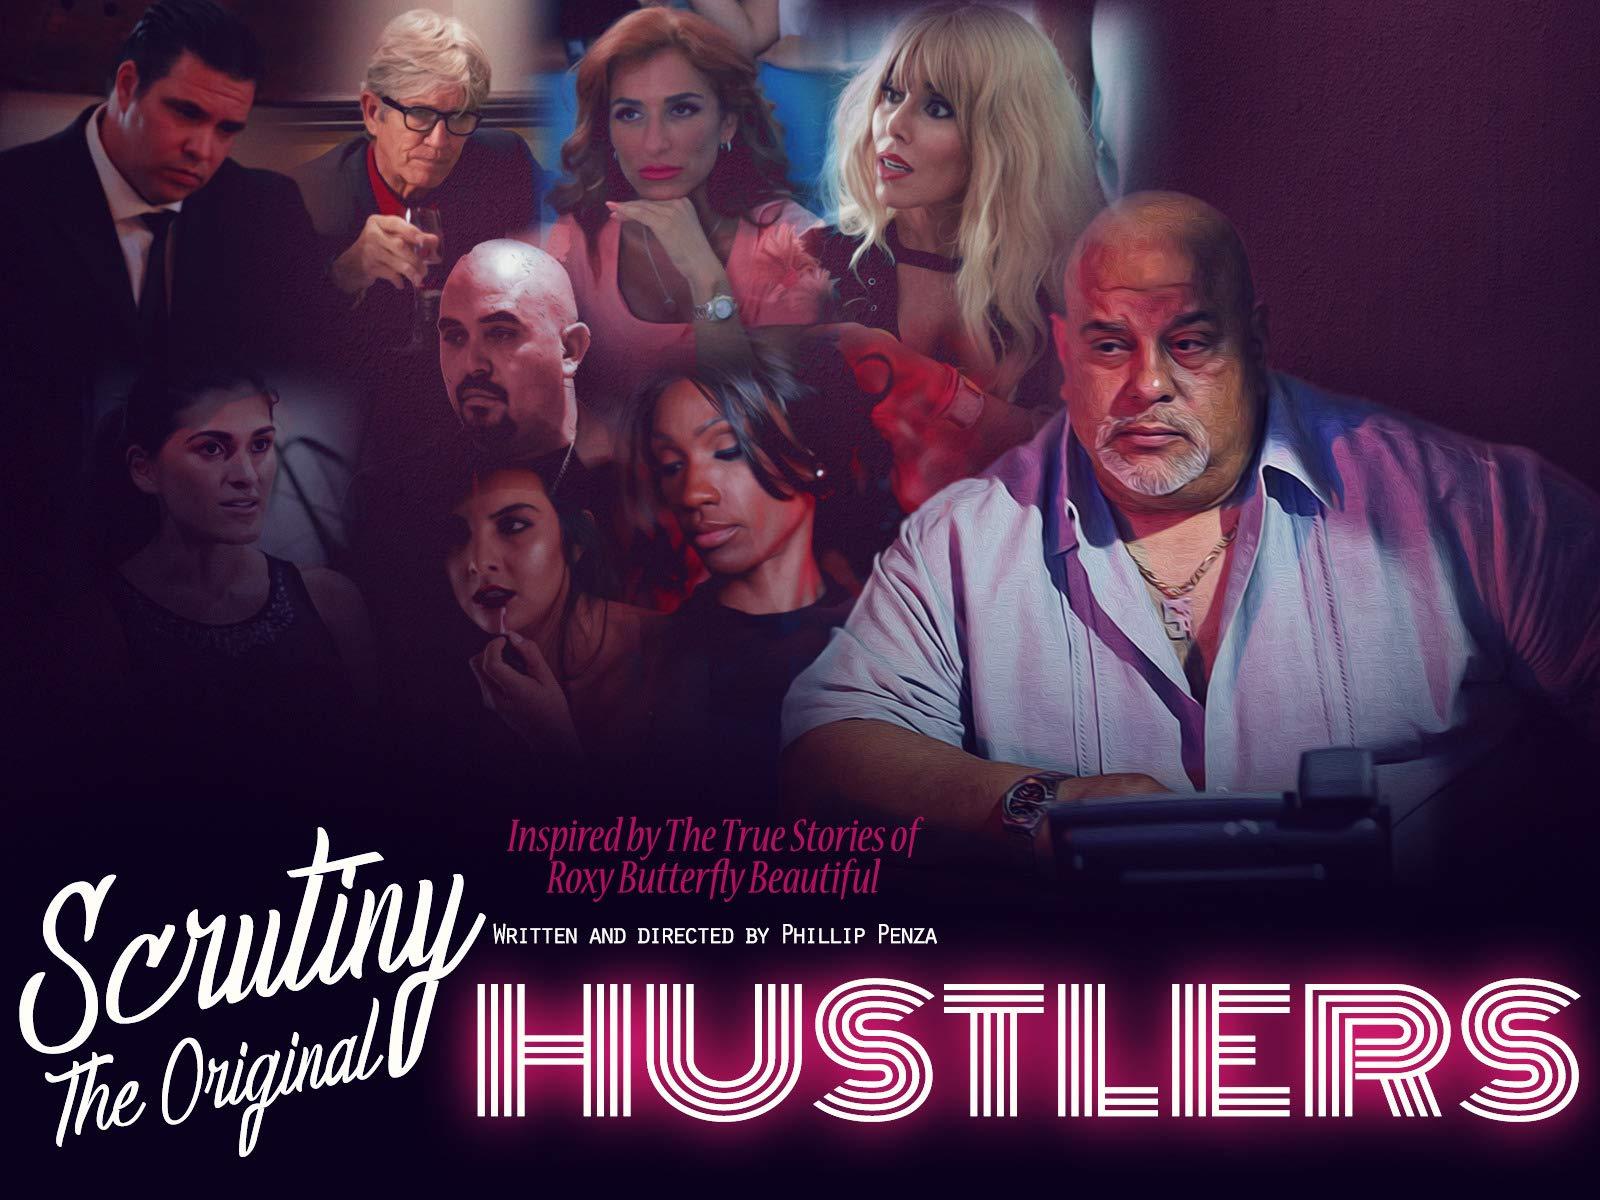 Scrutiny - The Original Hustlers